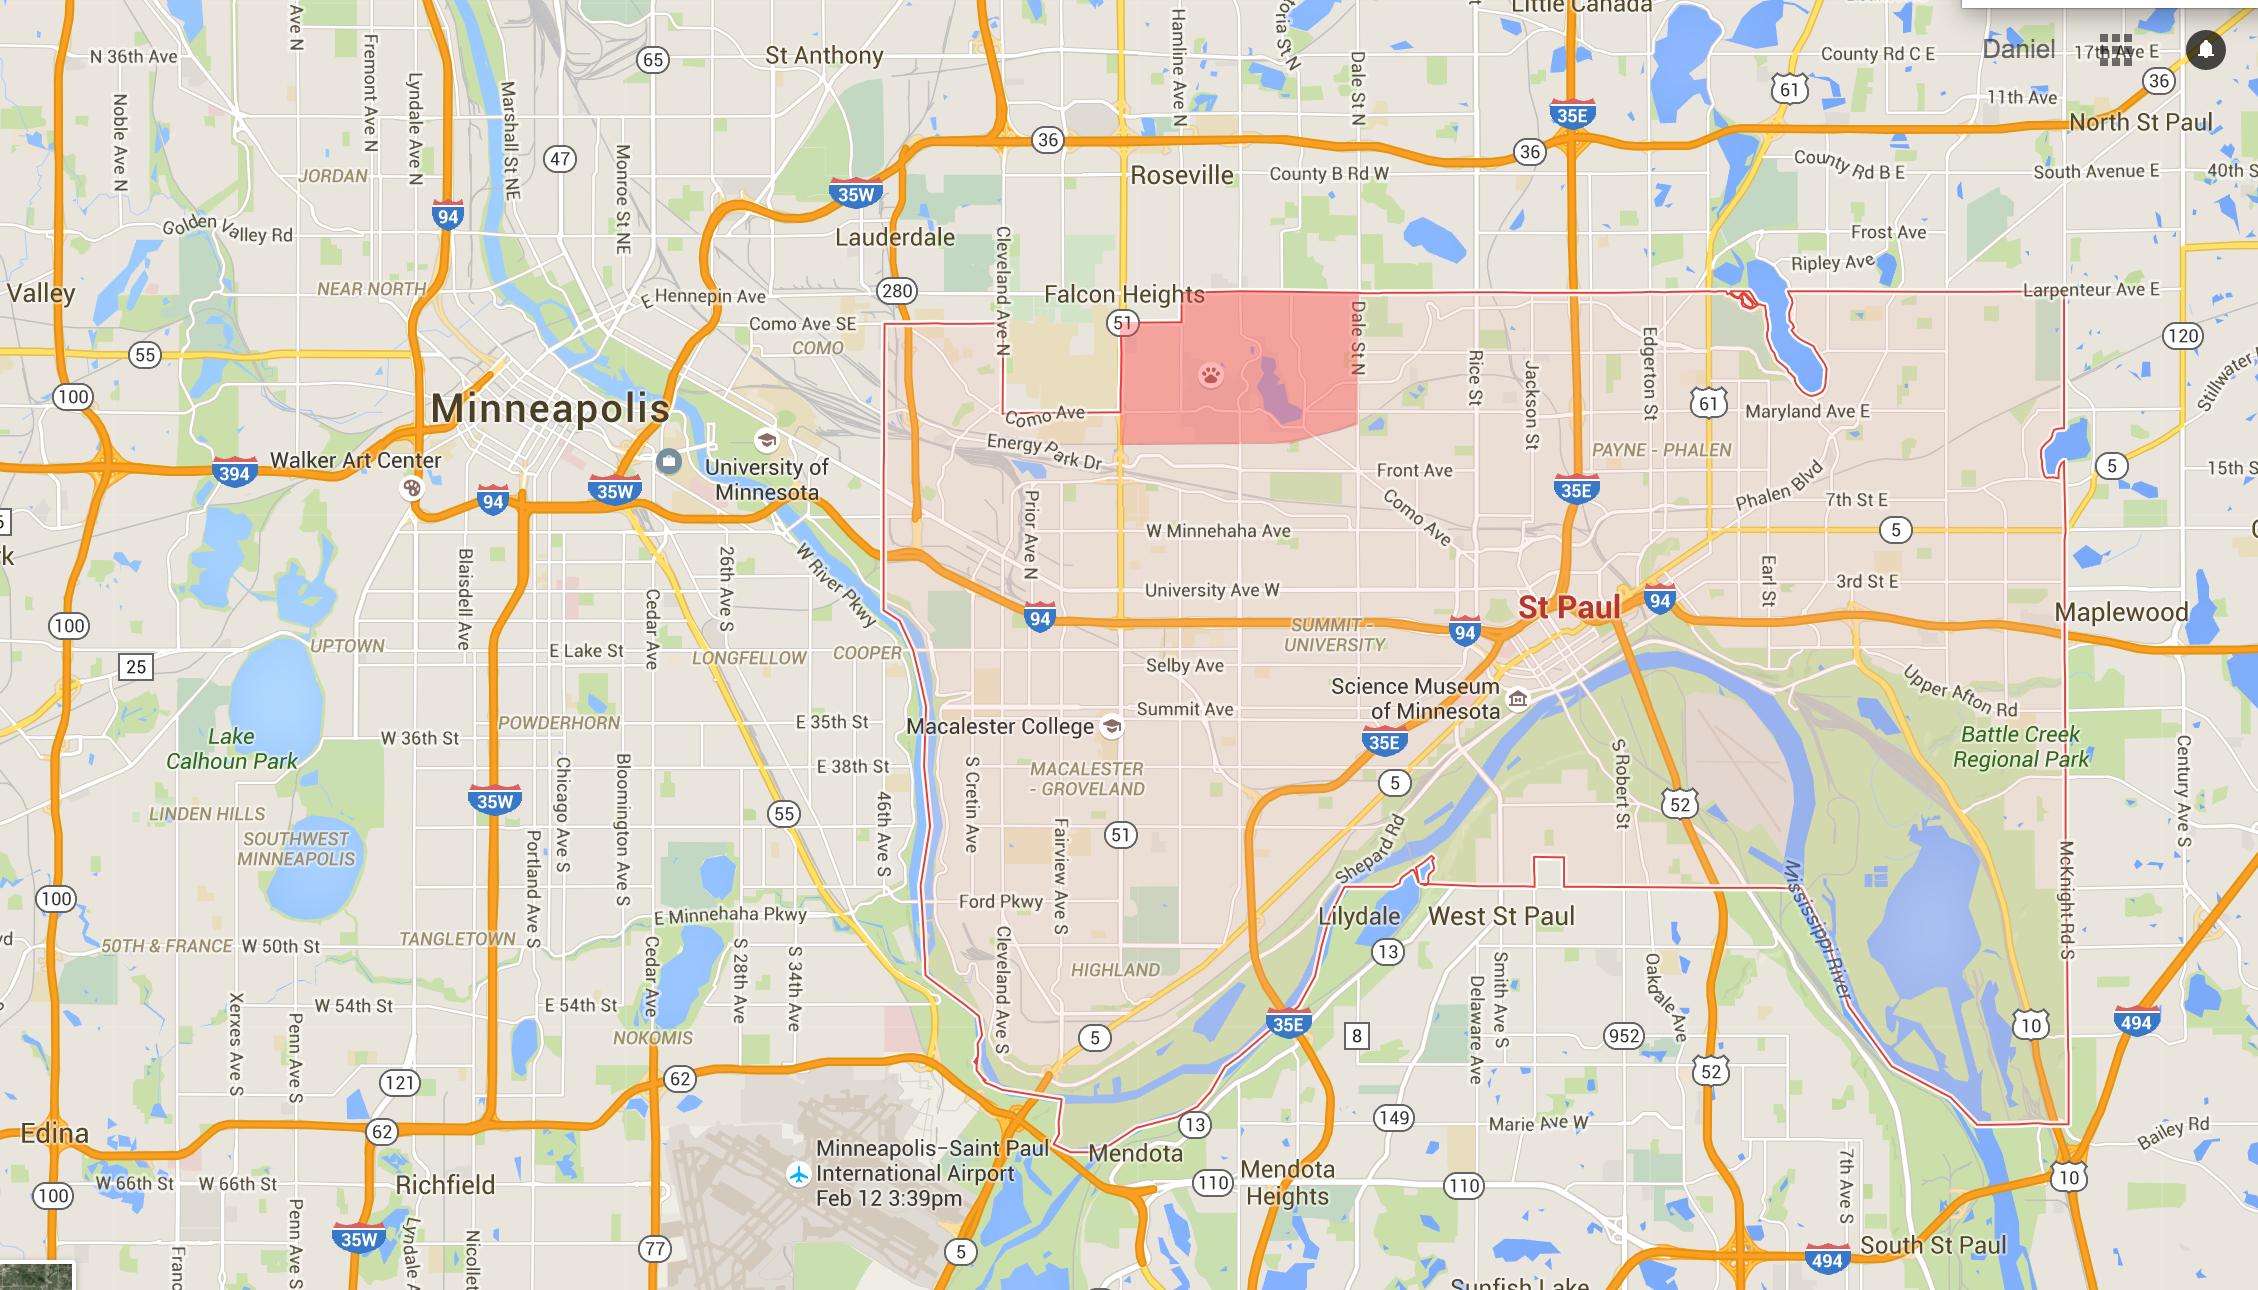 Como neighborhood on a map of St. Paul. Source: Google